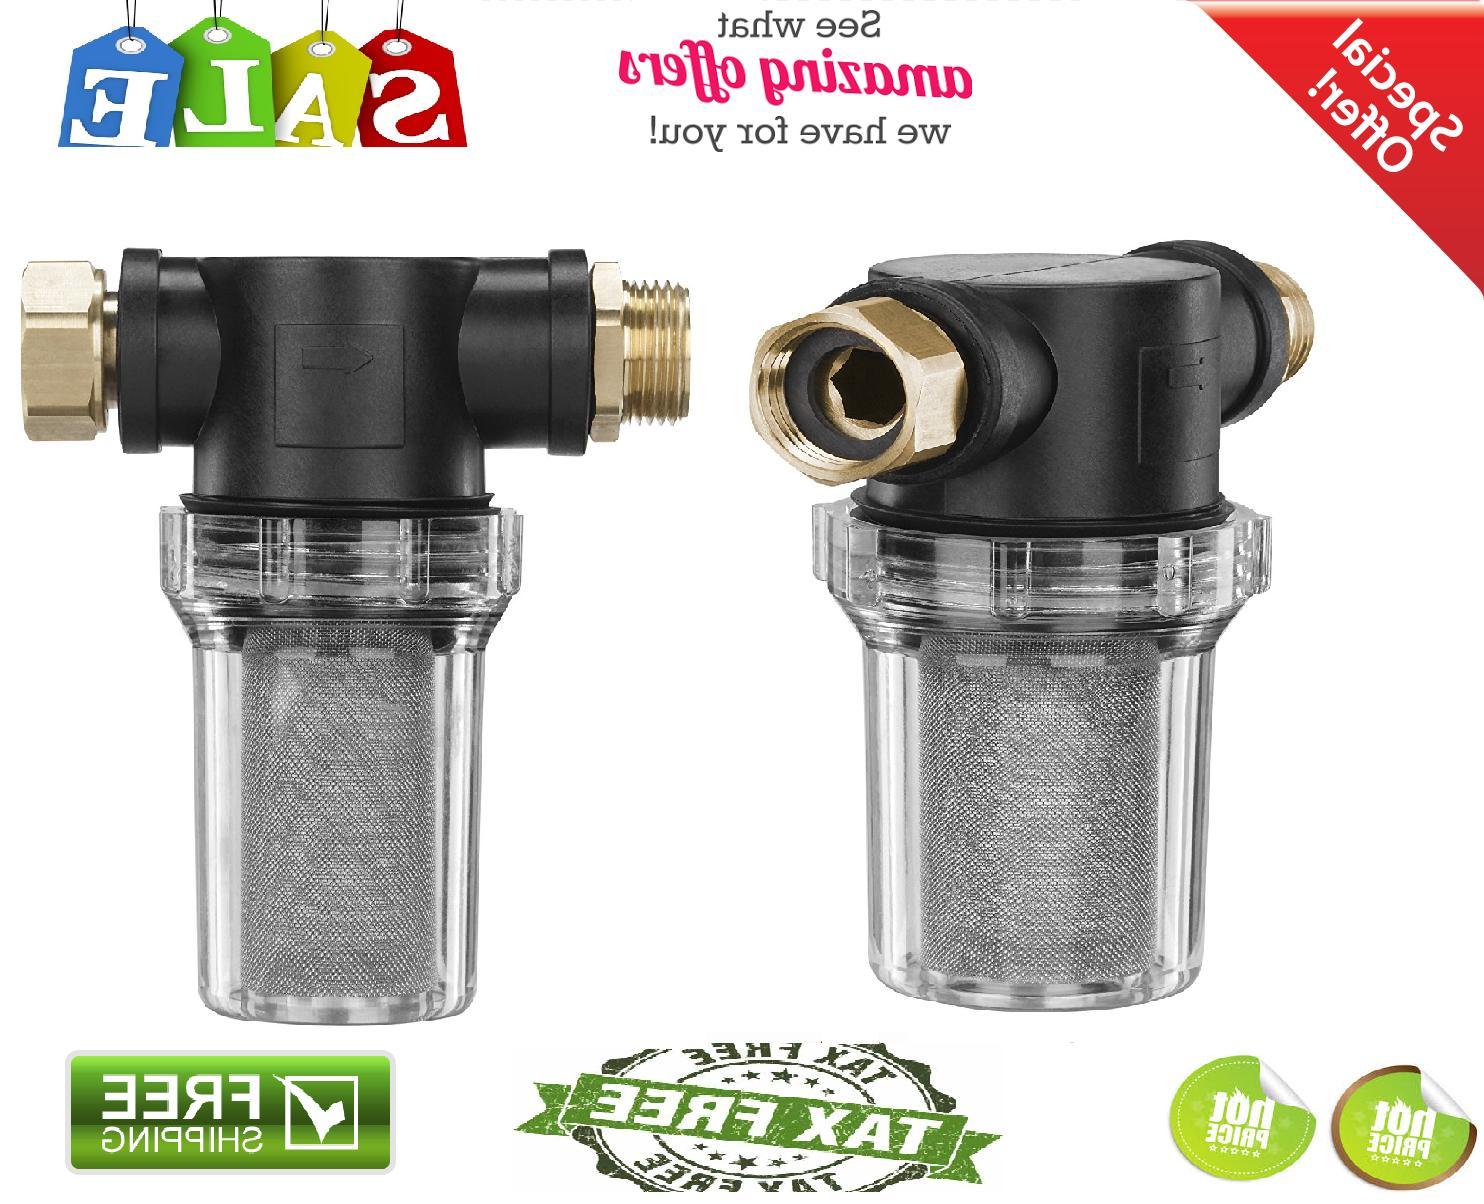 Inlet Filter Water Garden Hose spigot PF31089 Protect Pressu